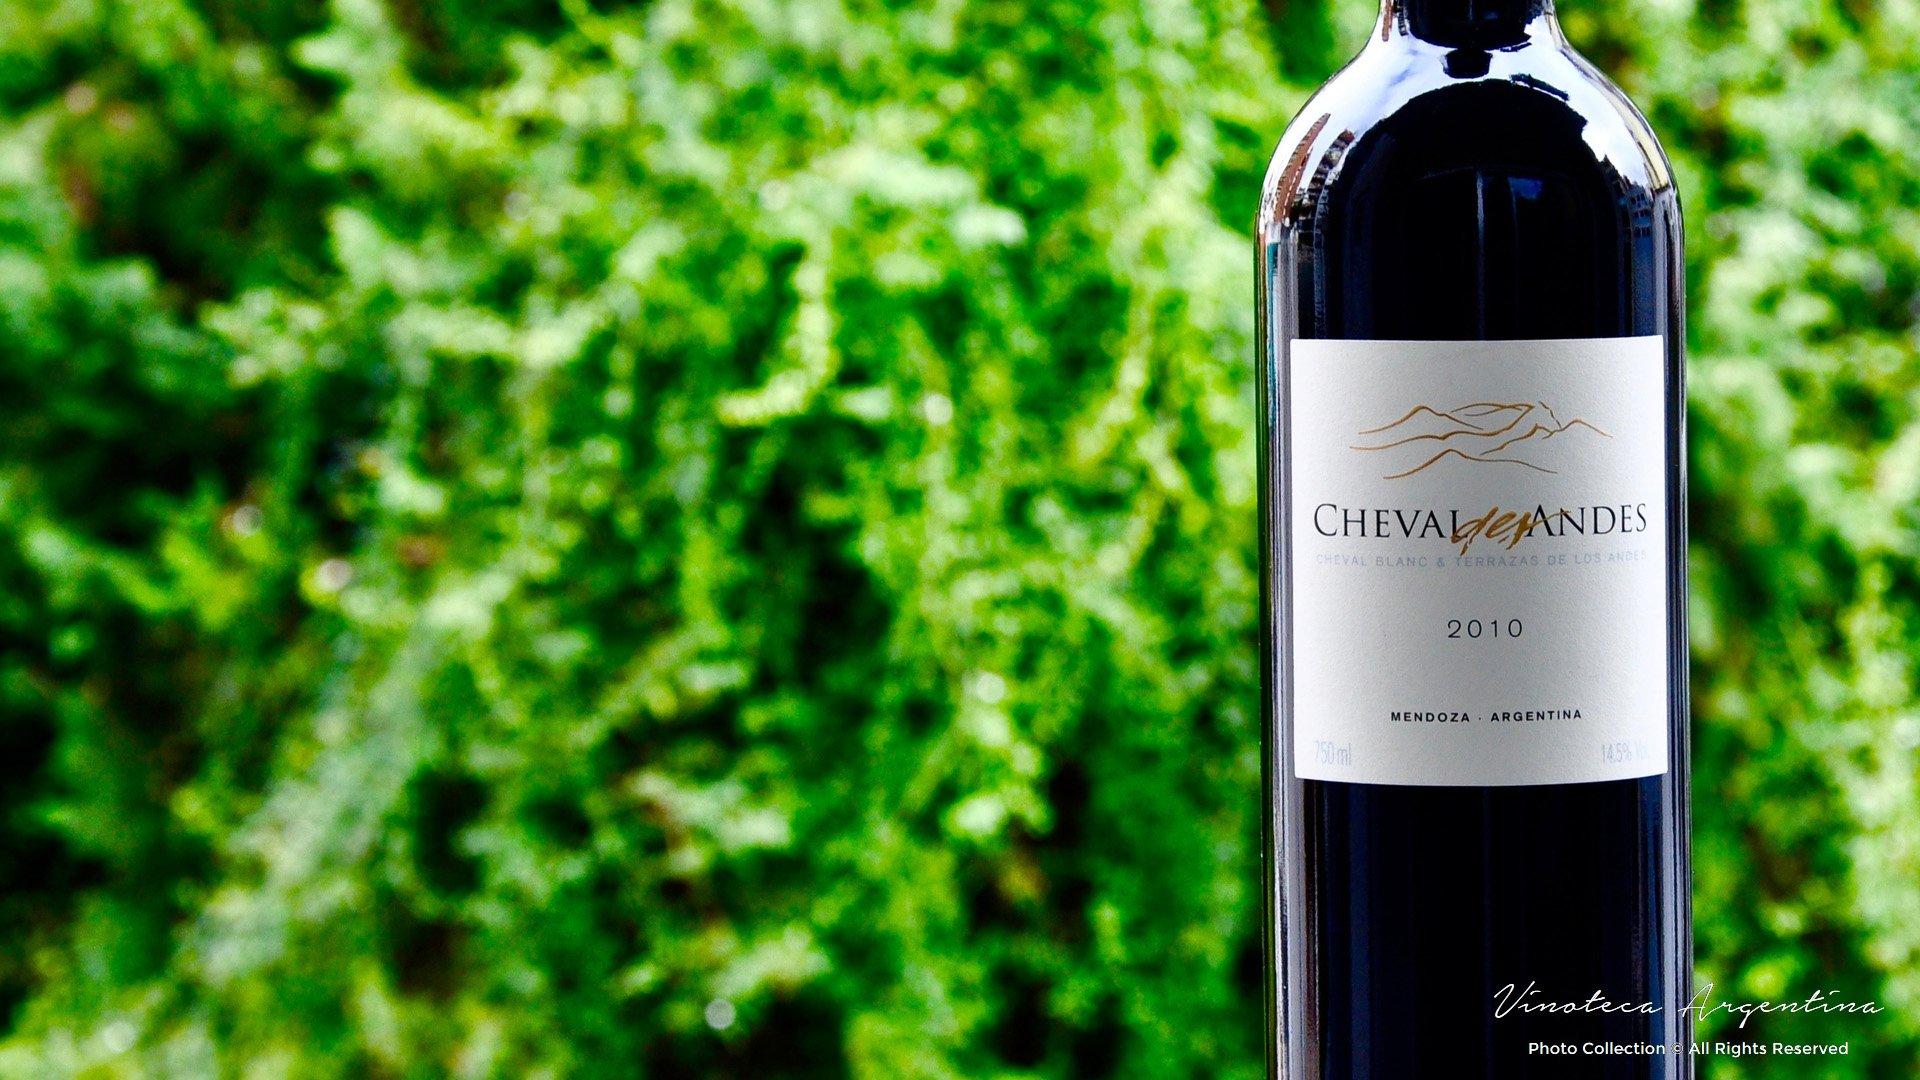 Cheval Des Andes 2010 Vinoteca Argentina